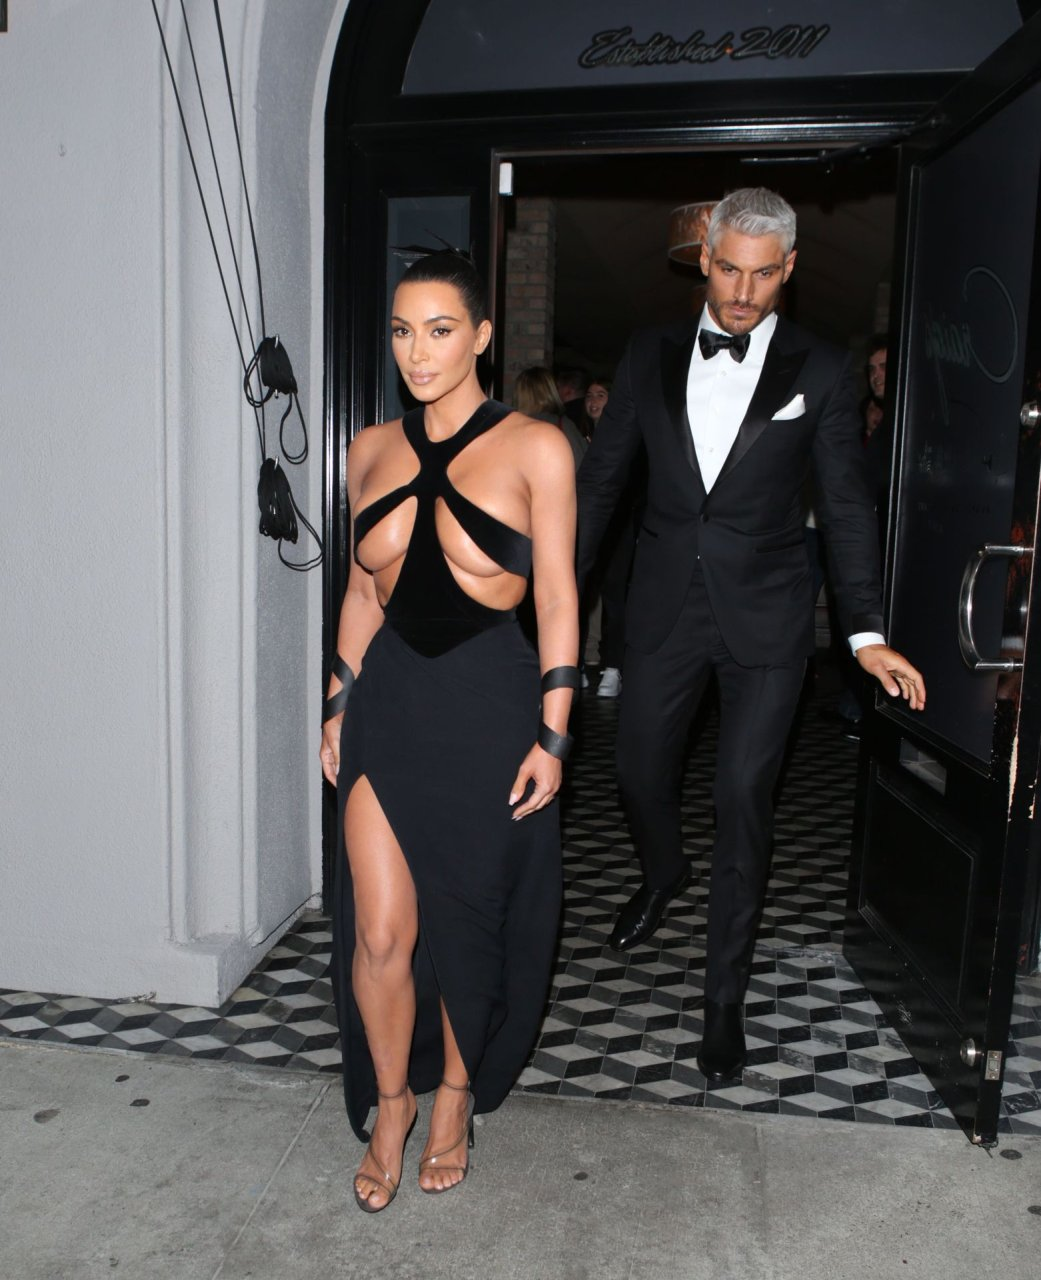 Kim Kardashian at the 5th Annual Hollywood Beauty Awards in Hollywood, CA 17-02-2019